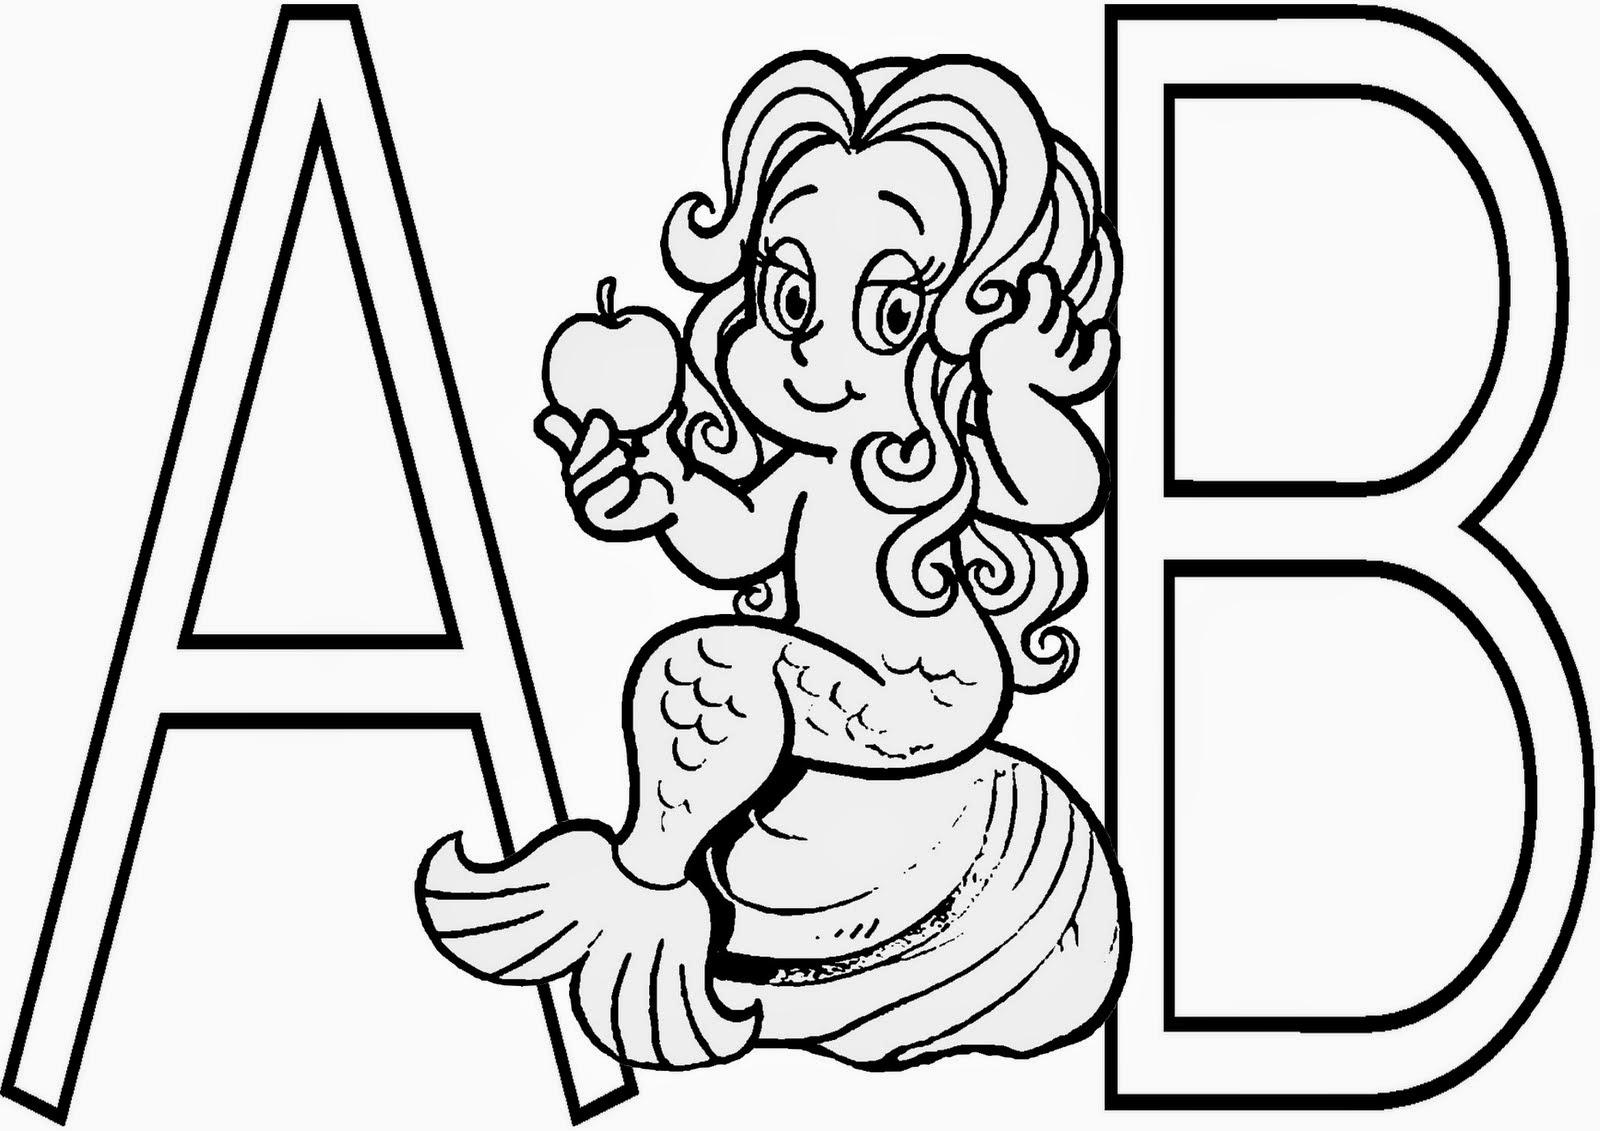 Alfabeto De Folclore Para Colorir Espaco Educar Desenhos Pintar